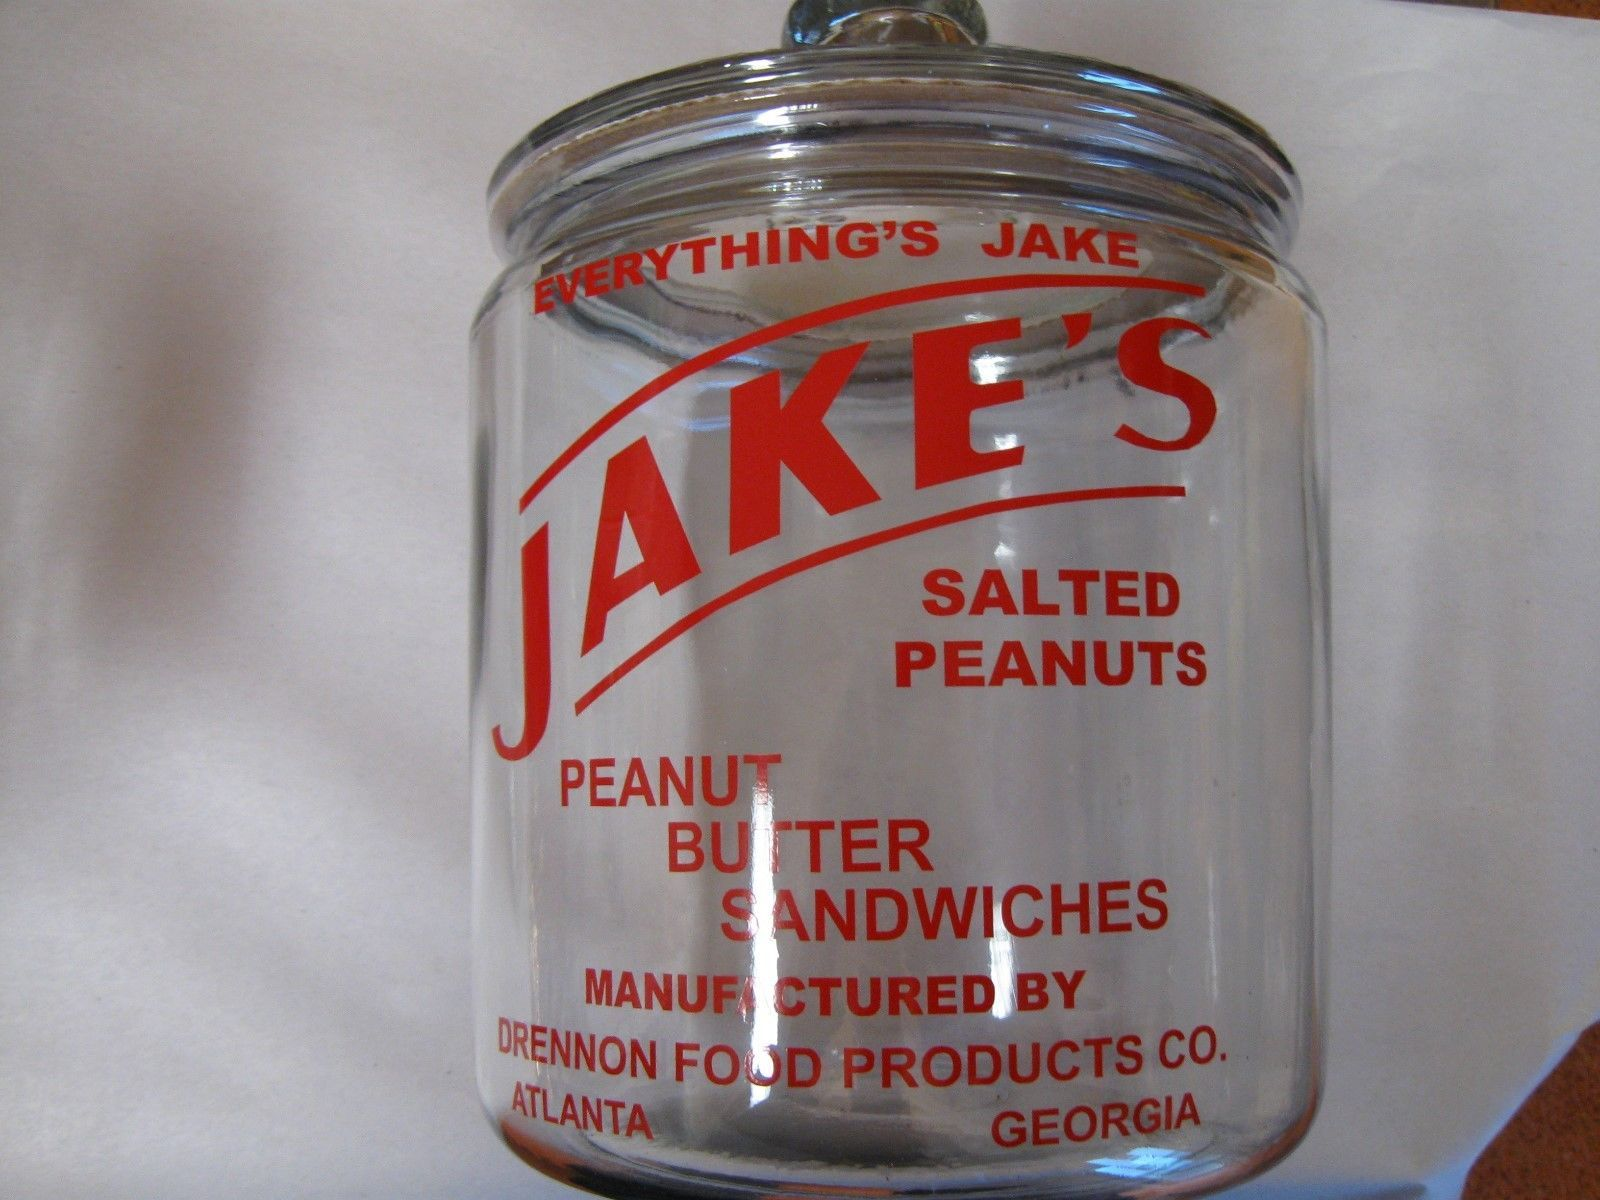 New Jake's Salted Peanuts Glass Jar with Lid   eBay